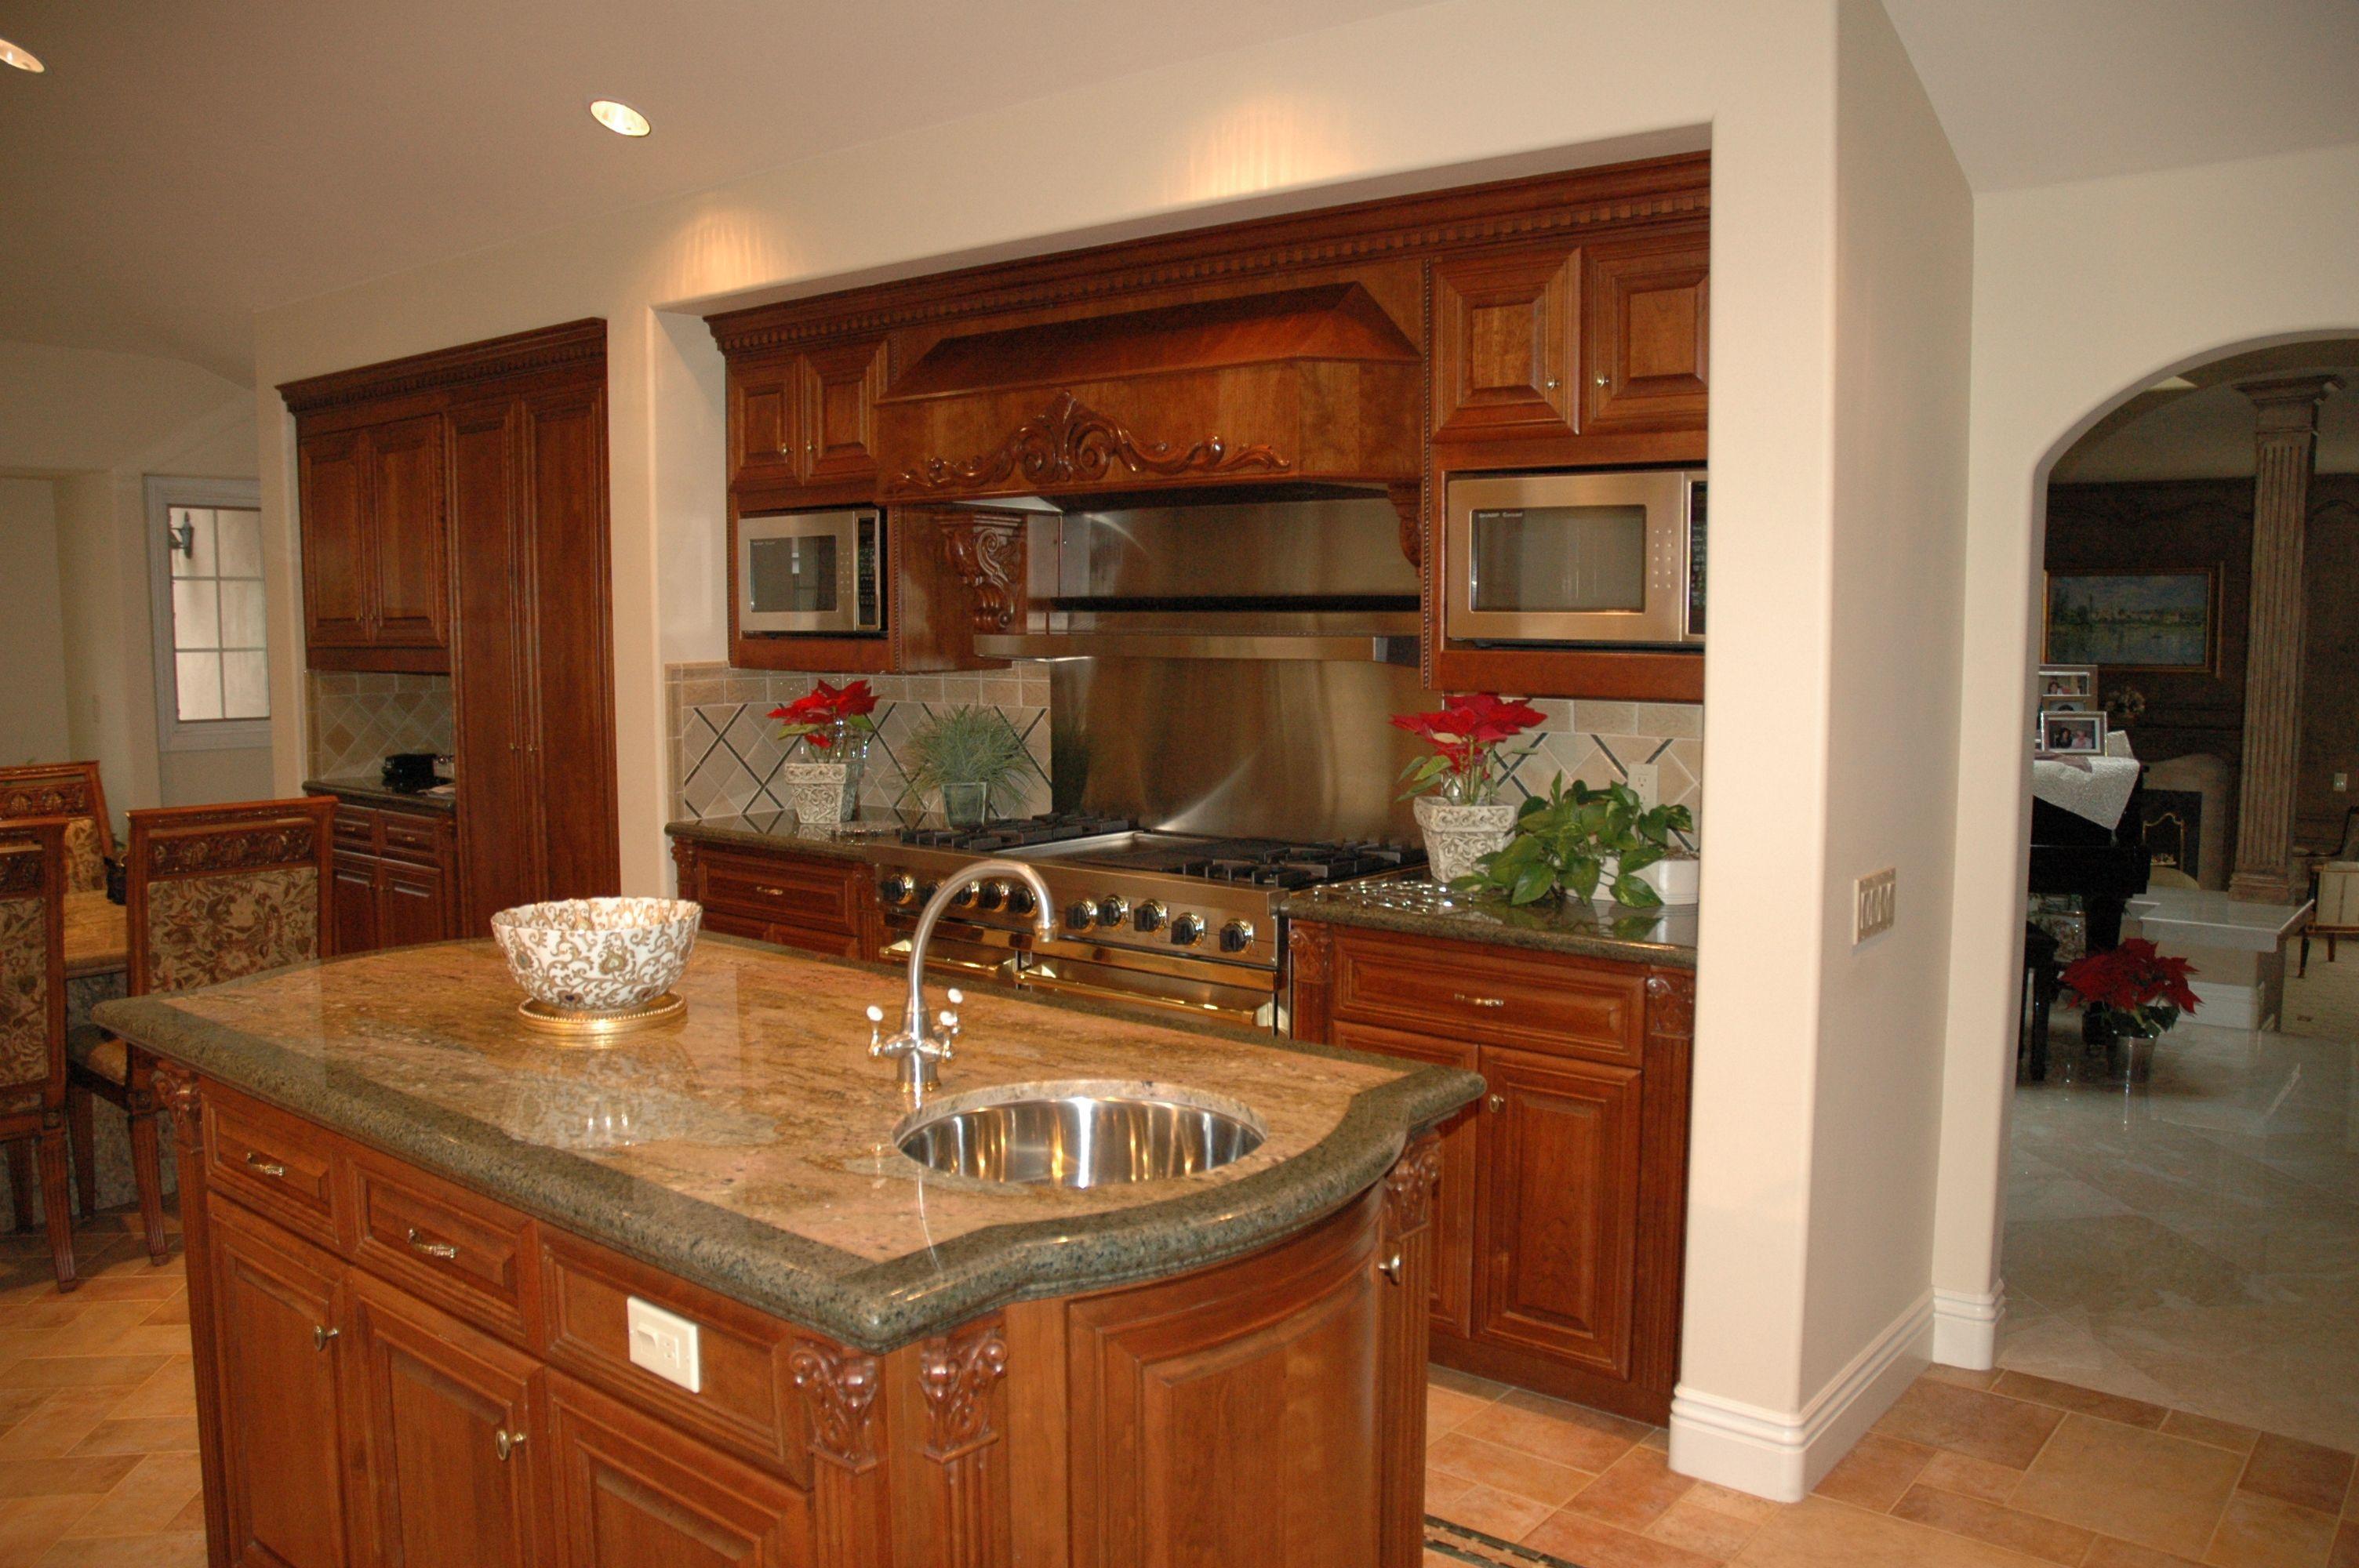 Holland S Custom Cabinets San Diego County 619 443 6081 Kitchen Kitchen Cabinets Custom Cabinets